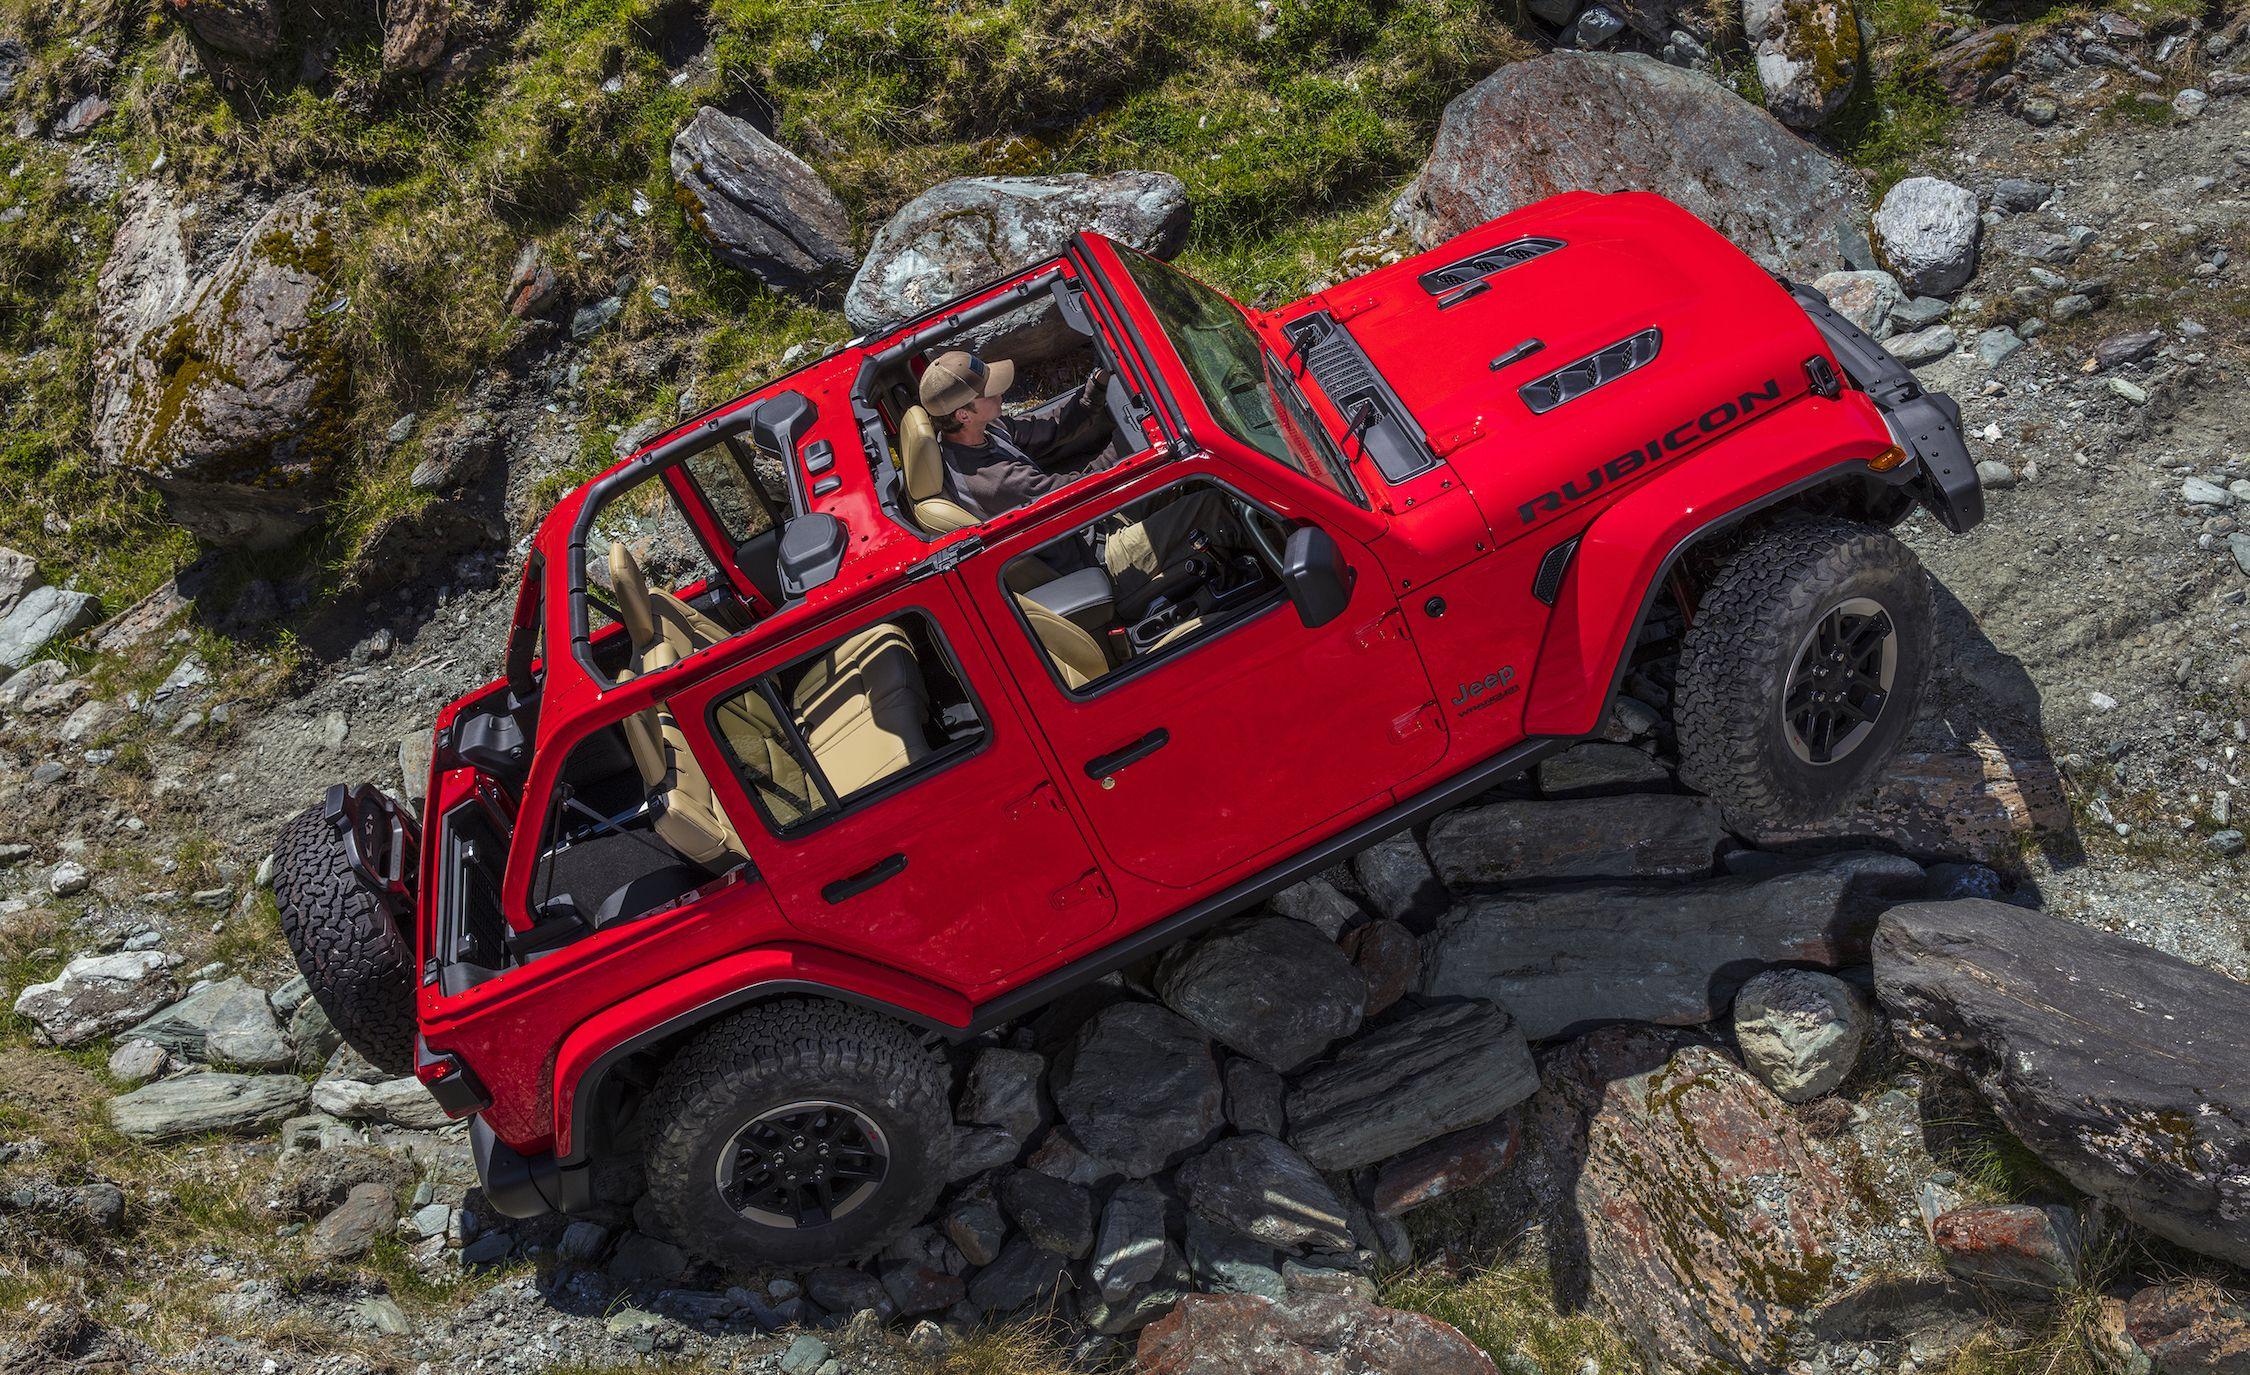 2019 Jeep Wrangler Reviews Jeep Wrangler Price Photos And Specs